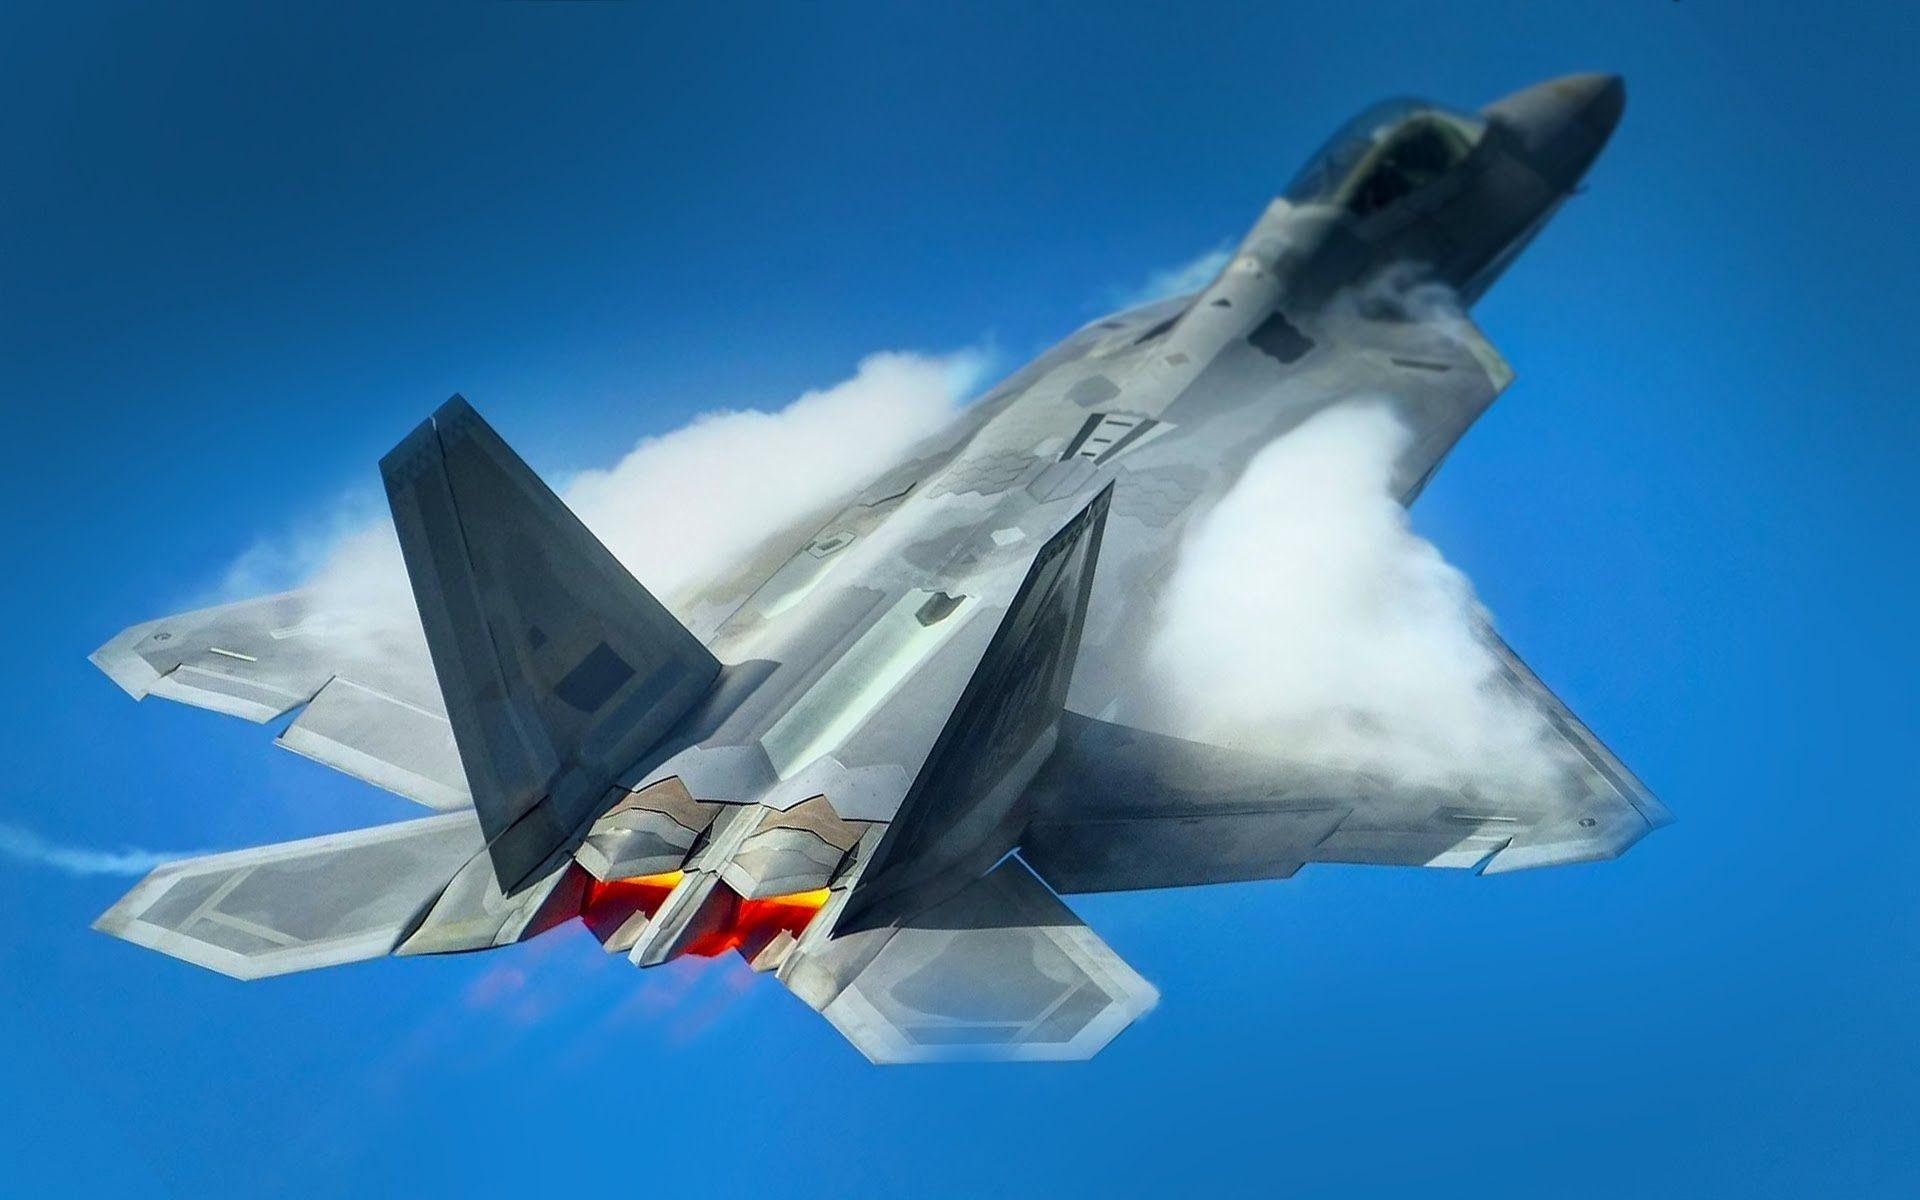 F22 Raptor Thrust Vectoring Approaching Supersonic Speed  3FomkCEG6BKSvTO68jwv_30_4e3186fc065835e053d327fc9732295e_image_original.jpg